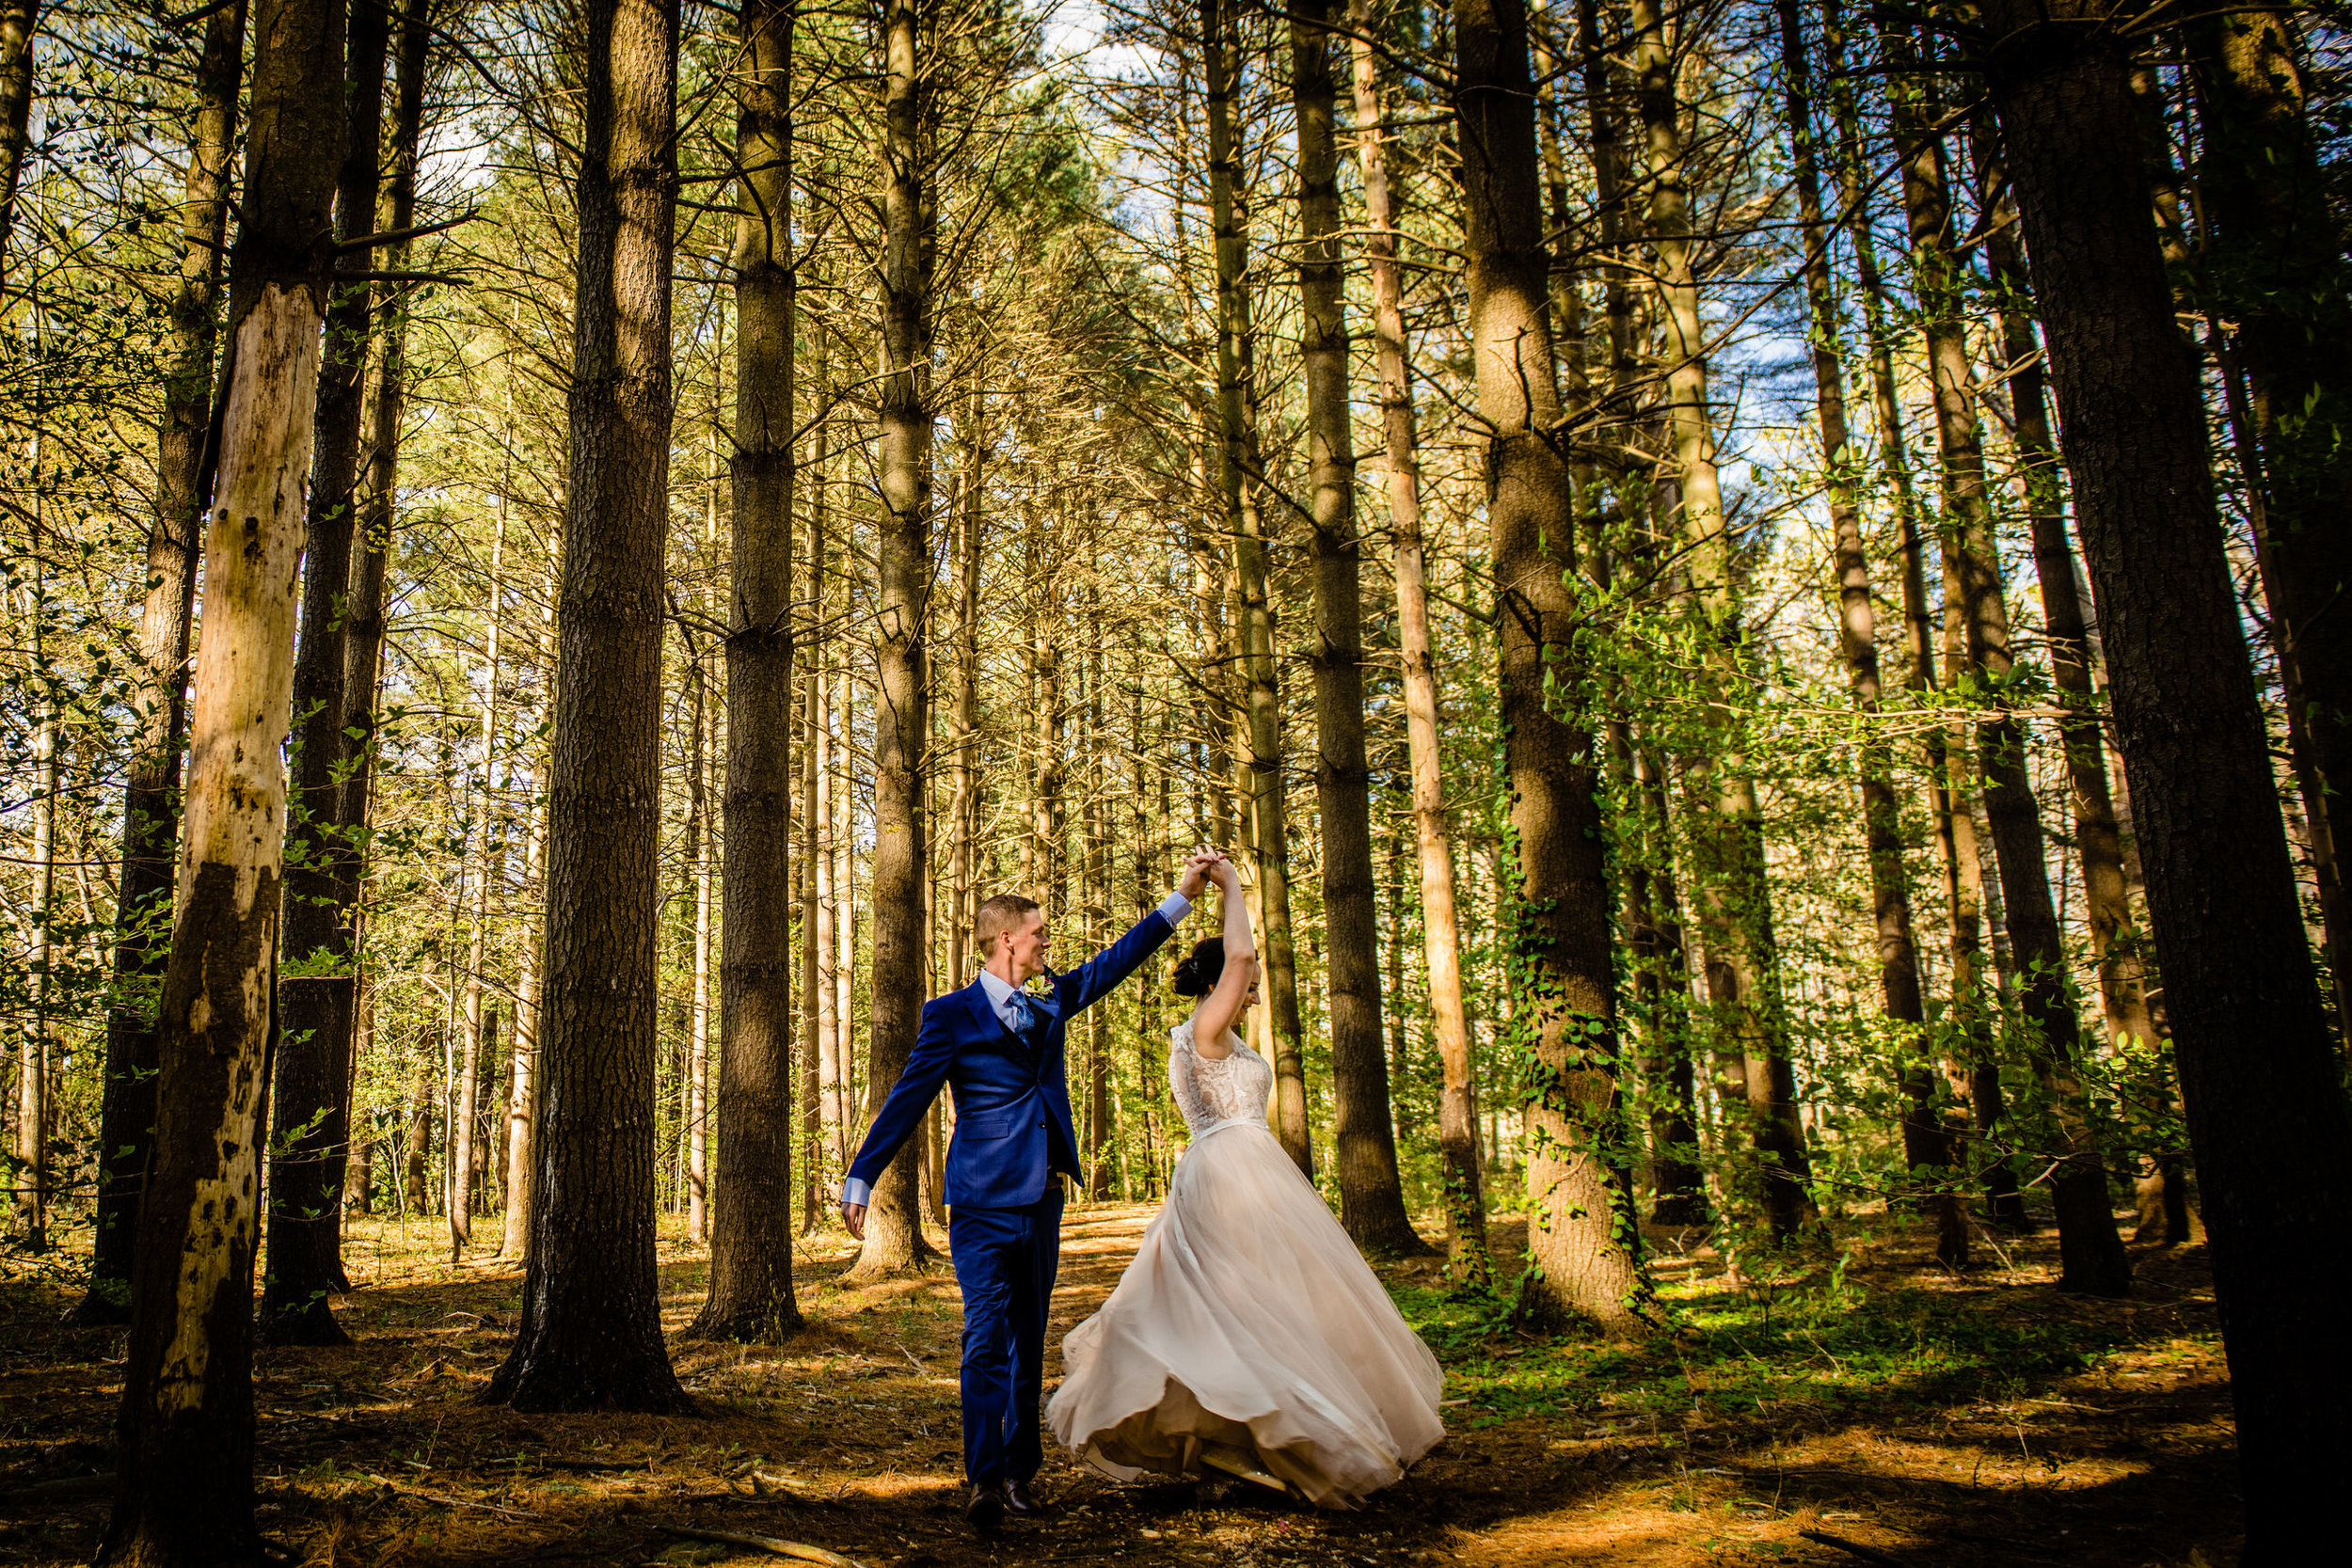 ThorpewoodWedding-Eileen&Chris-5955.jpg